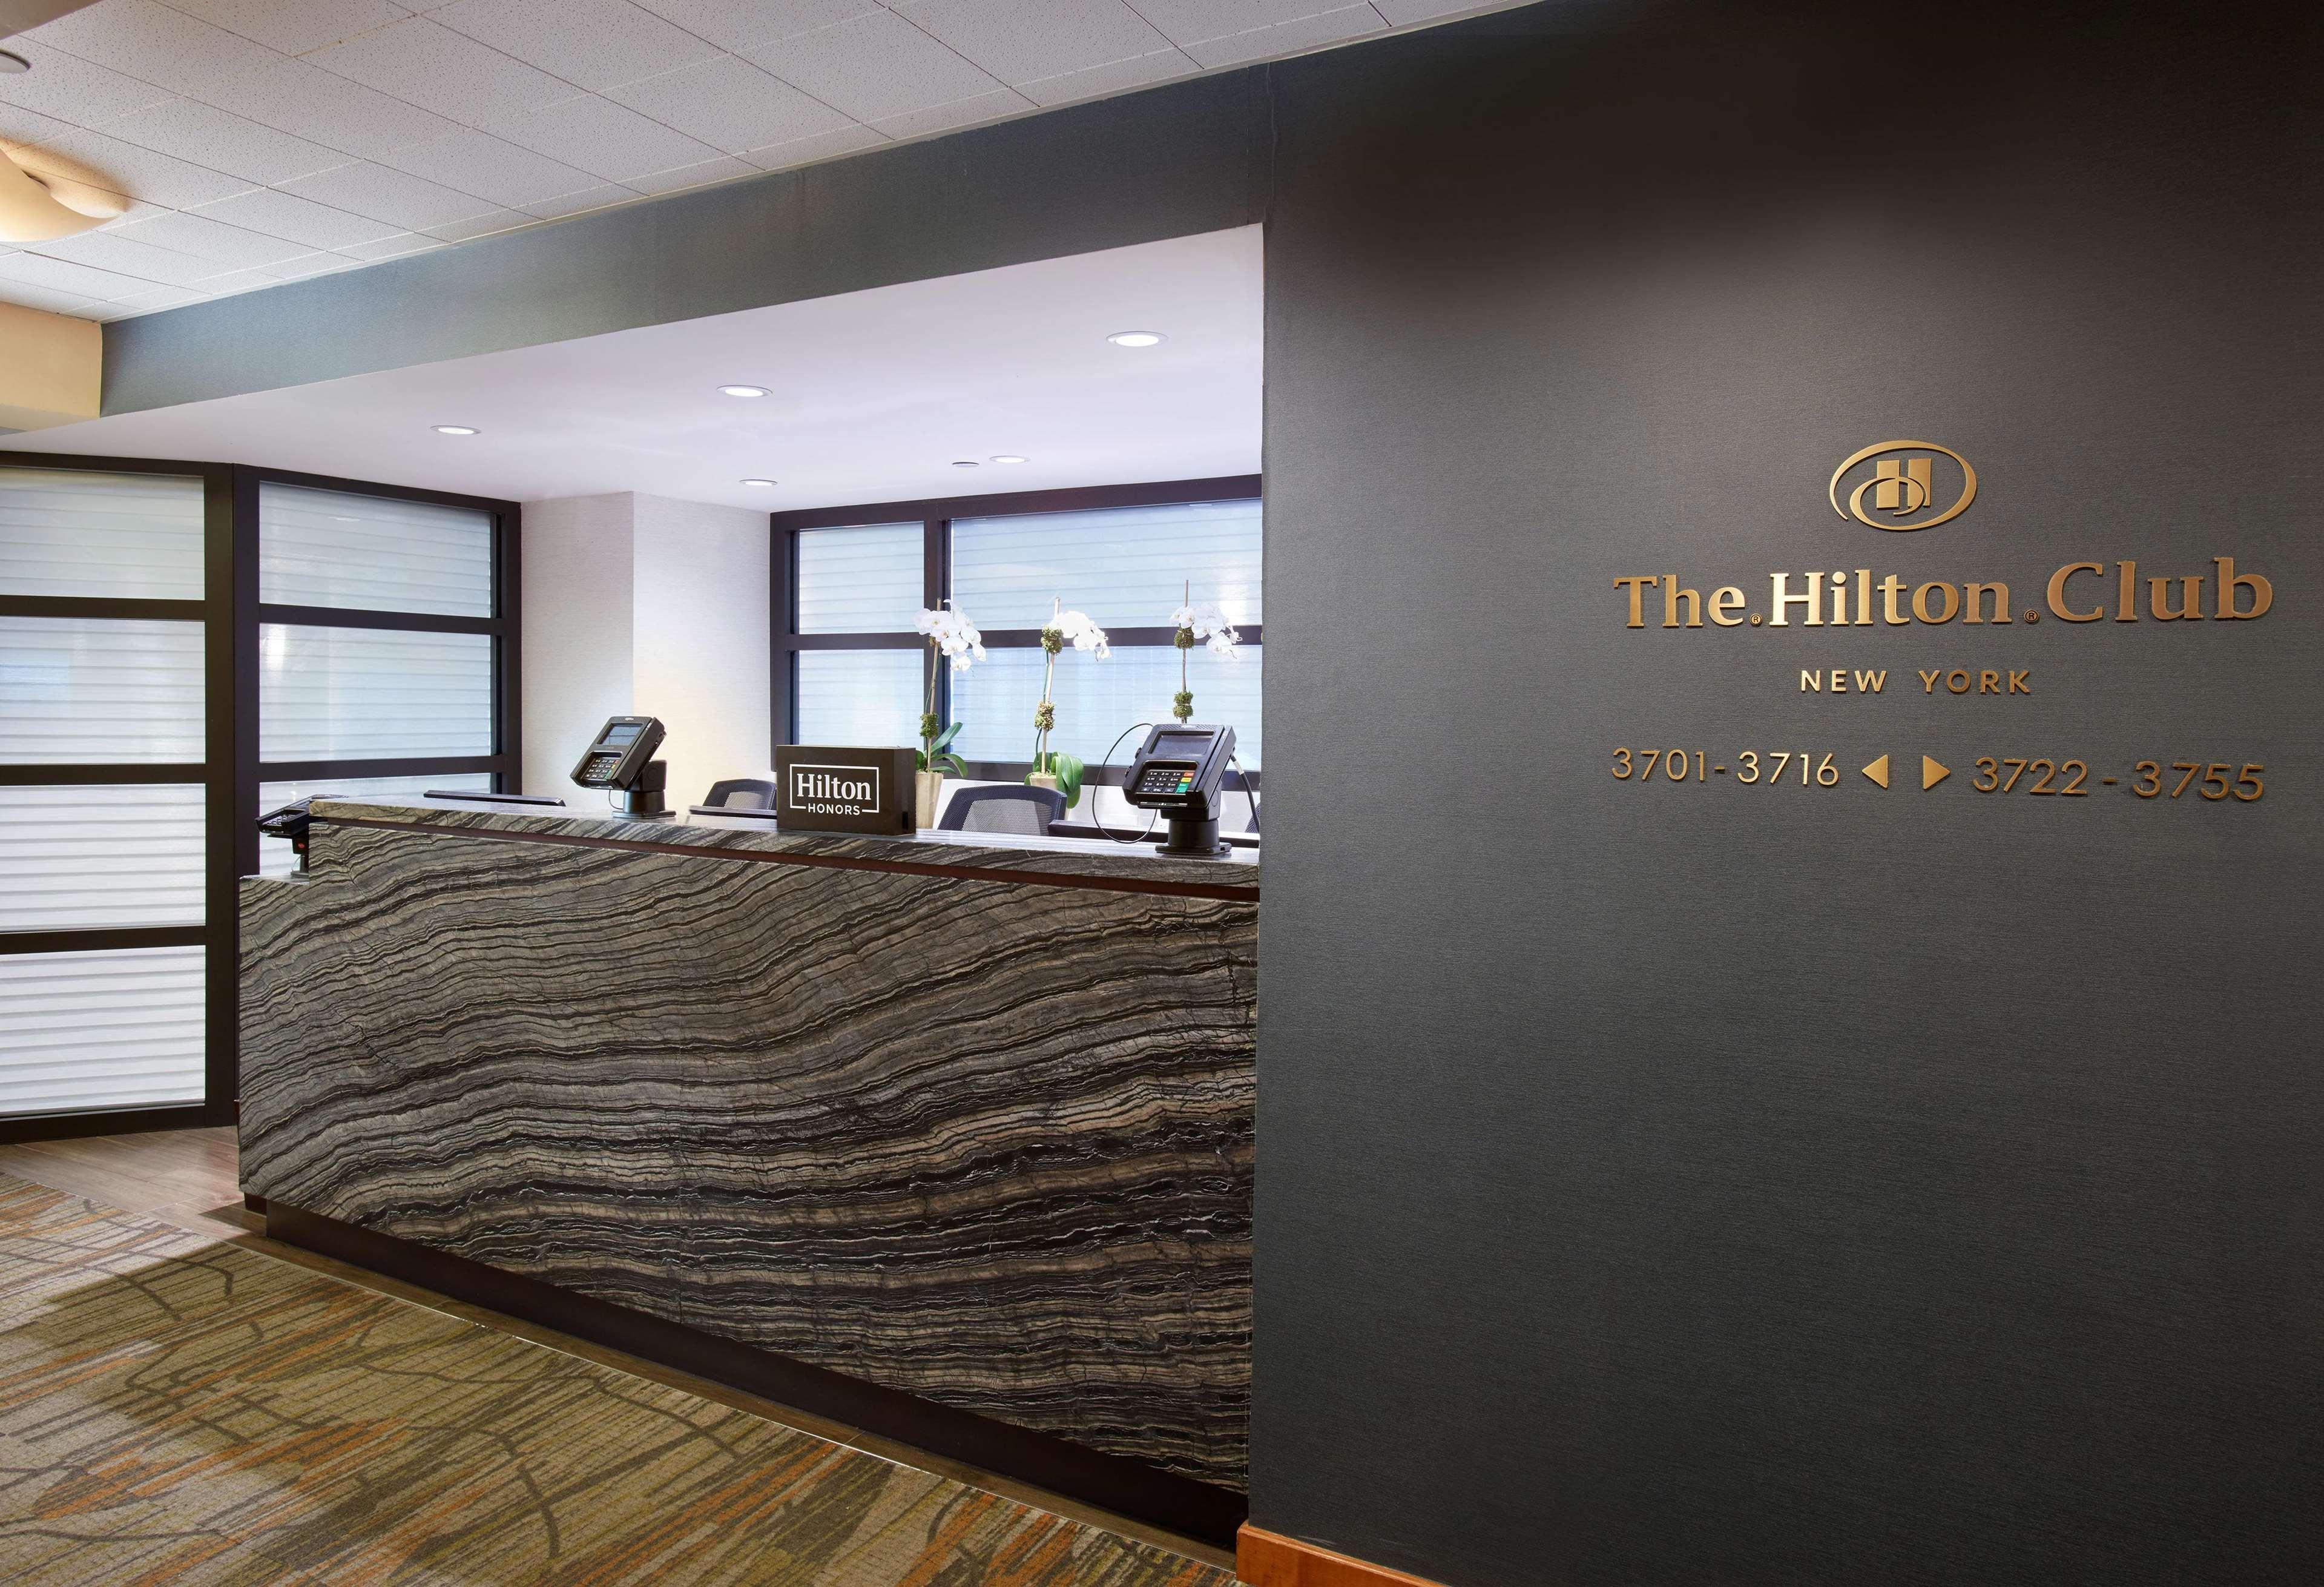 The Hilton Club - New York